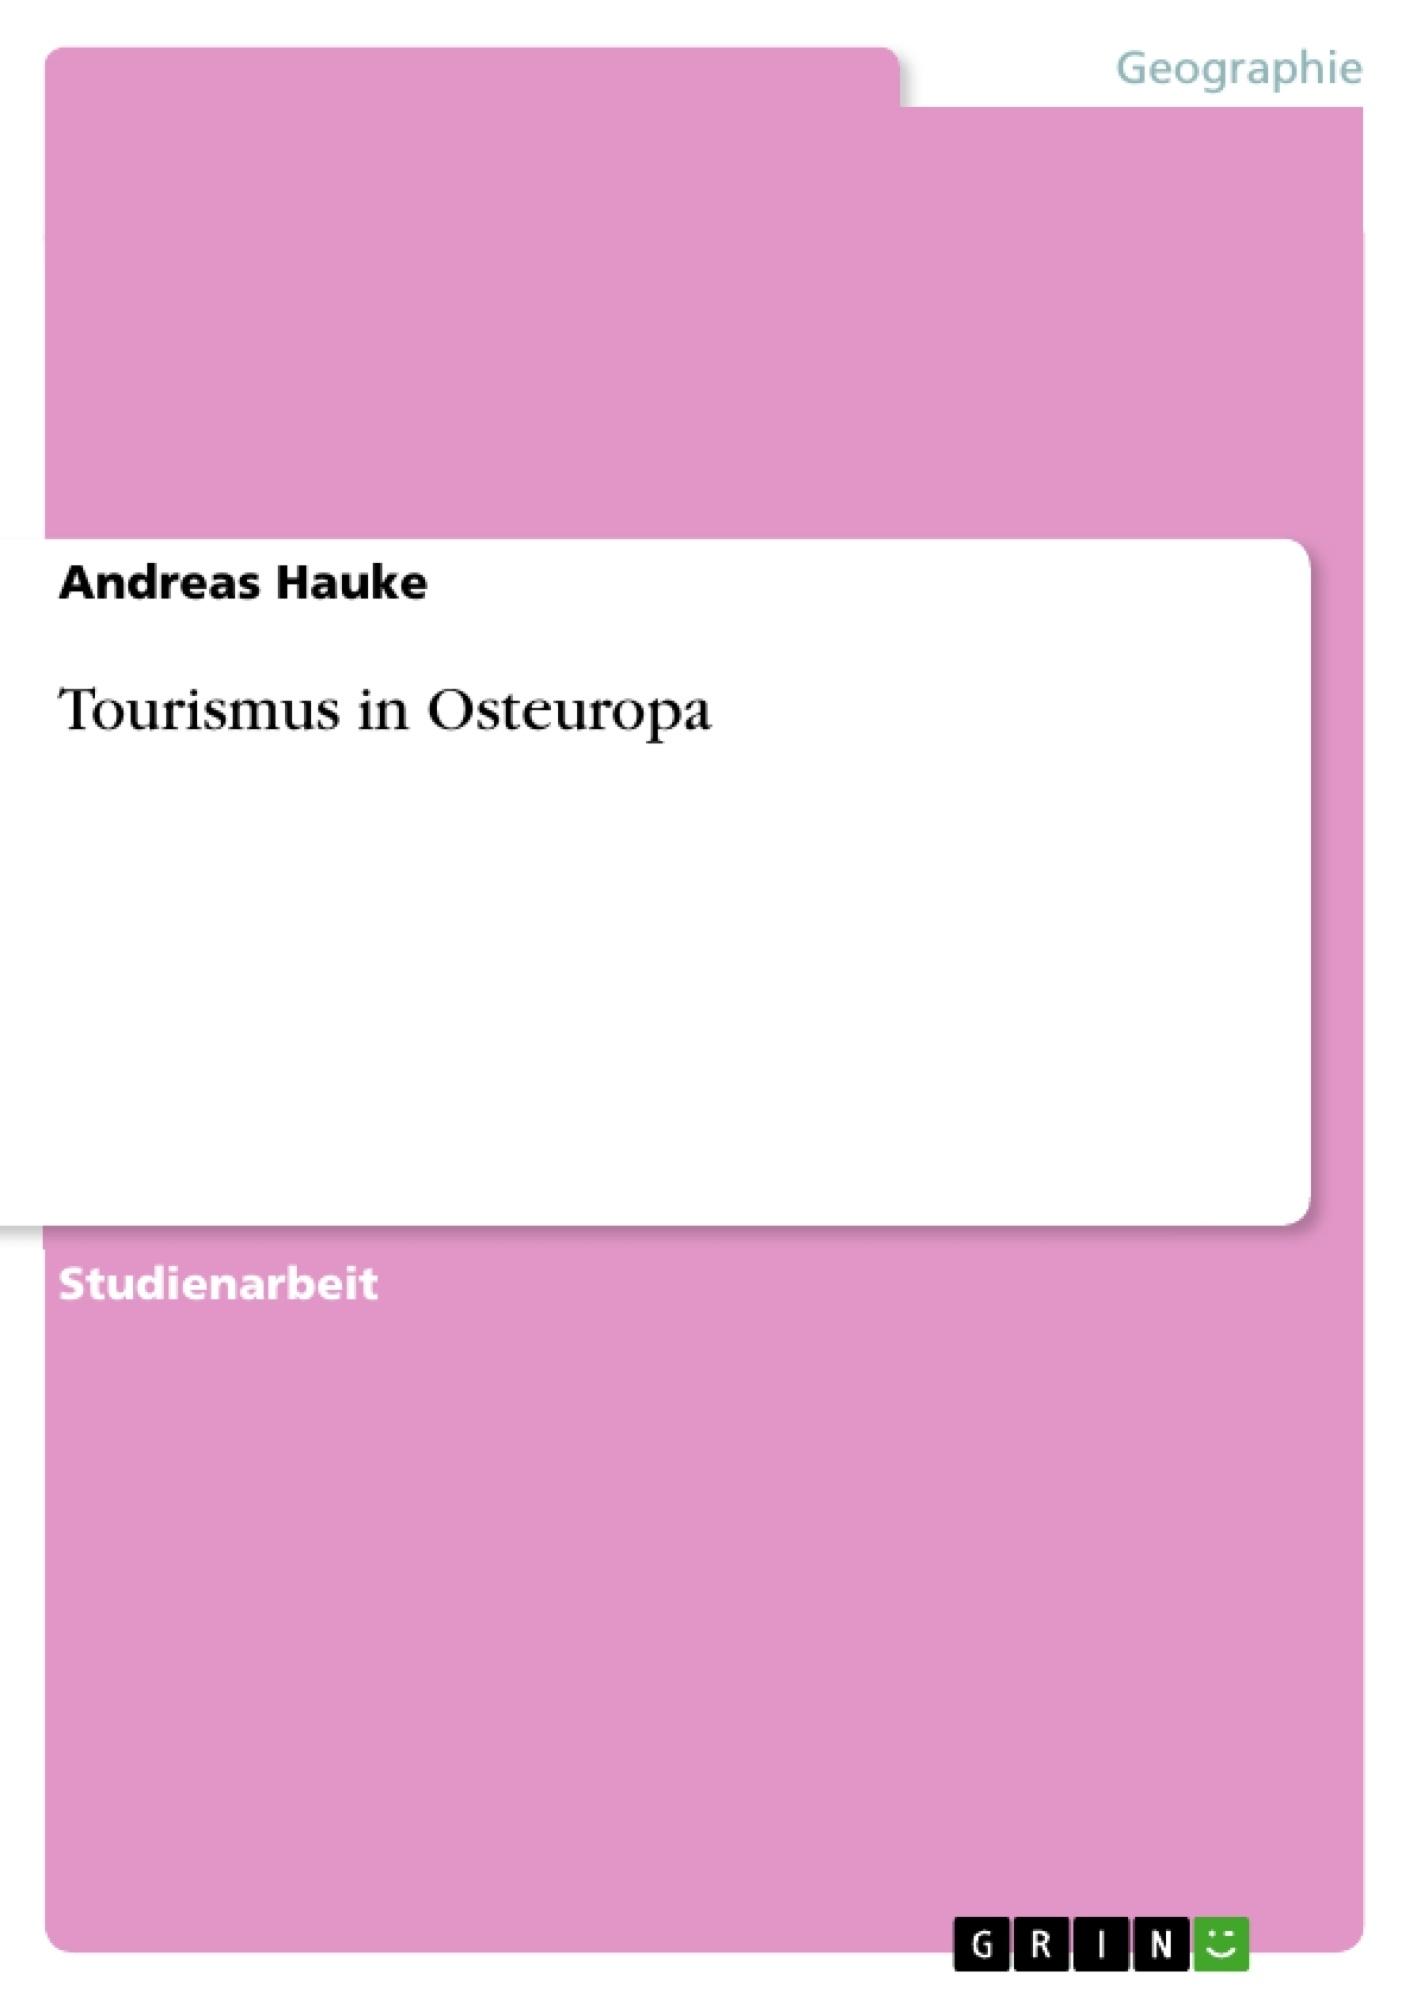 Titel: Tourismus in Osteuropa